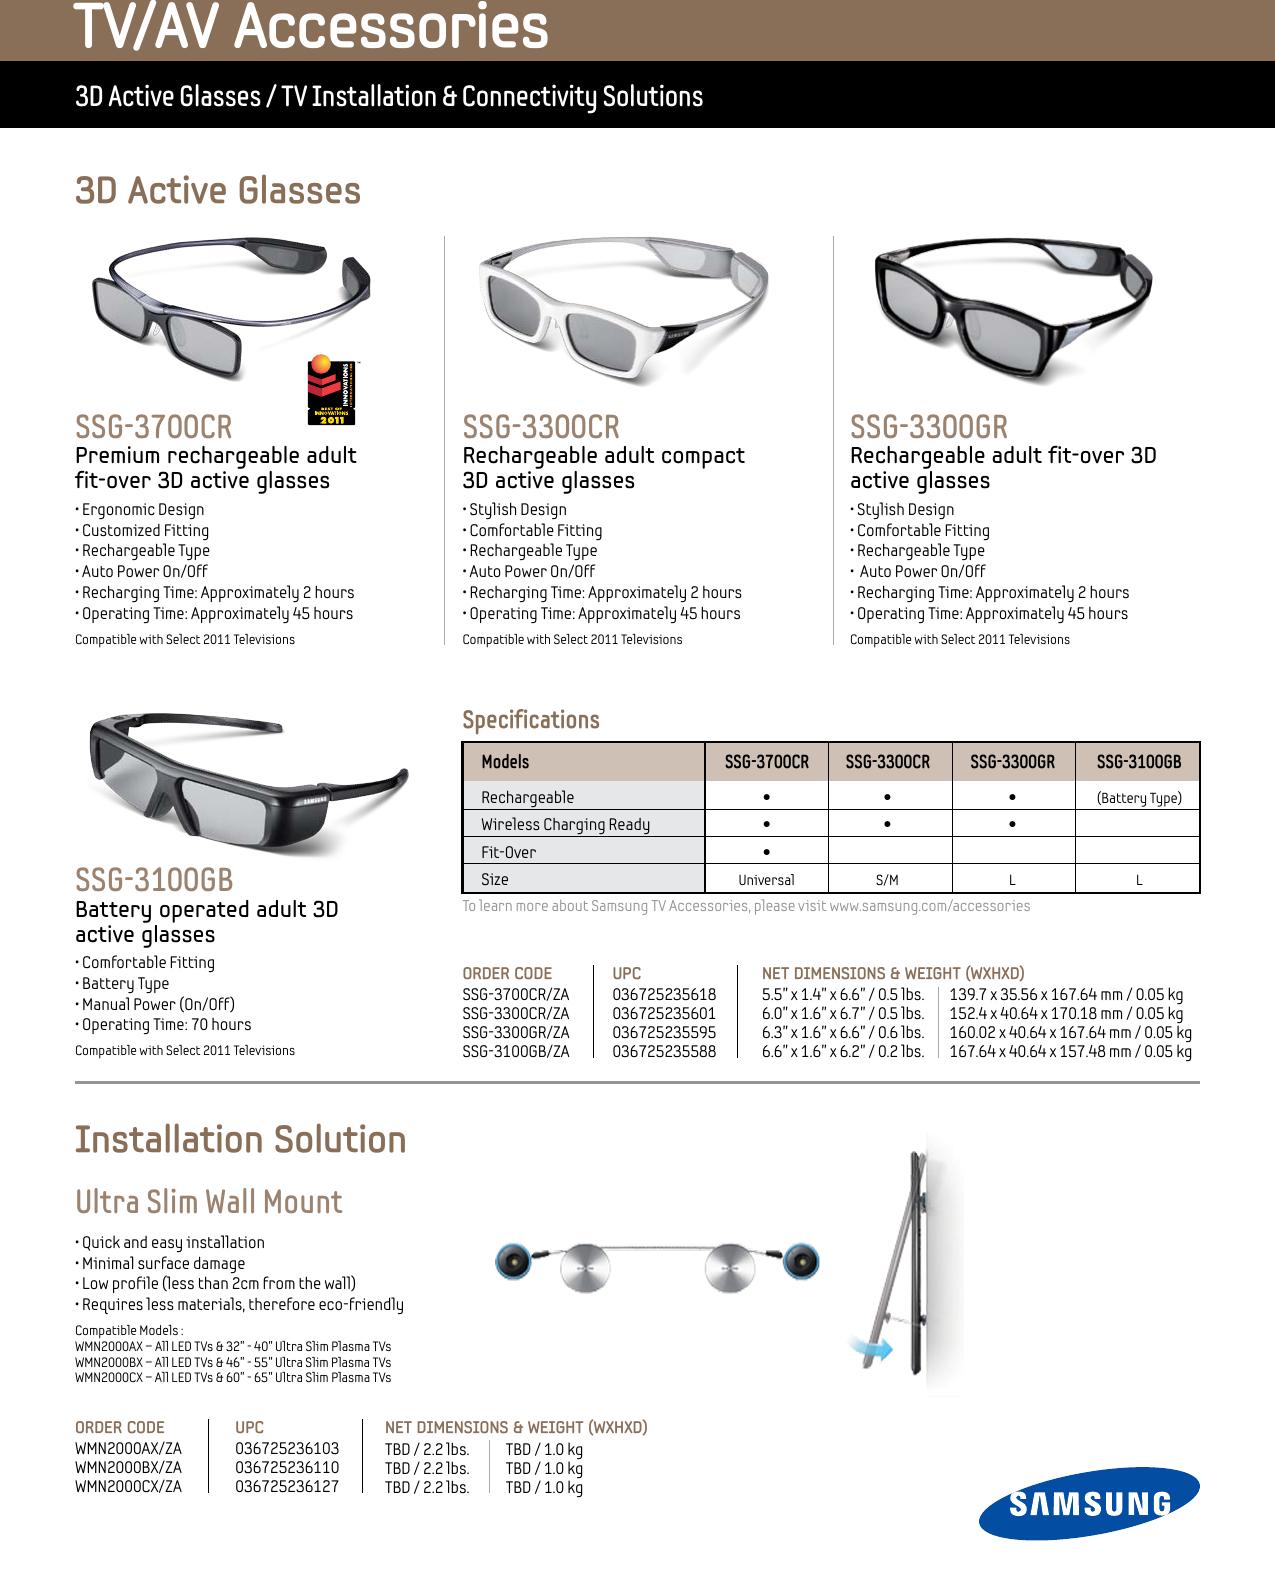 Samsung Smart Tv Skype Camera 720P Cystc1100Za Users Manual